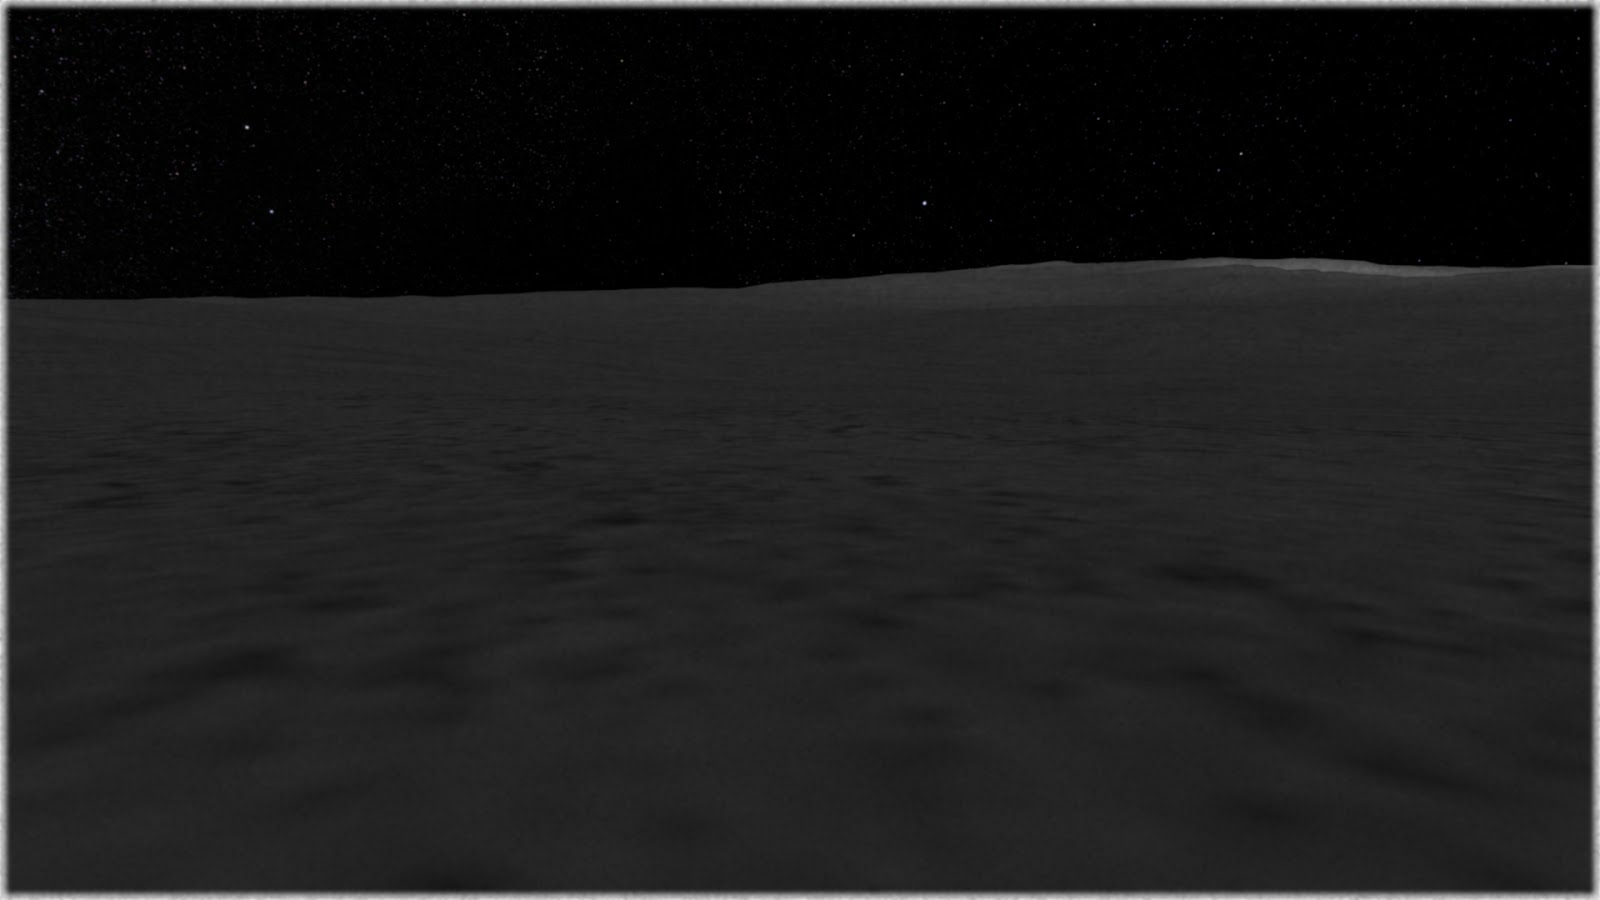 Kerbal Space Program - Mission Reports: CELESTIA XII RETURNS